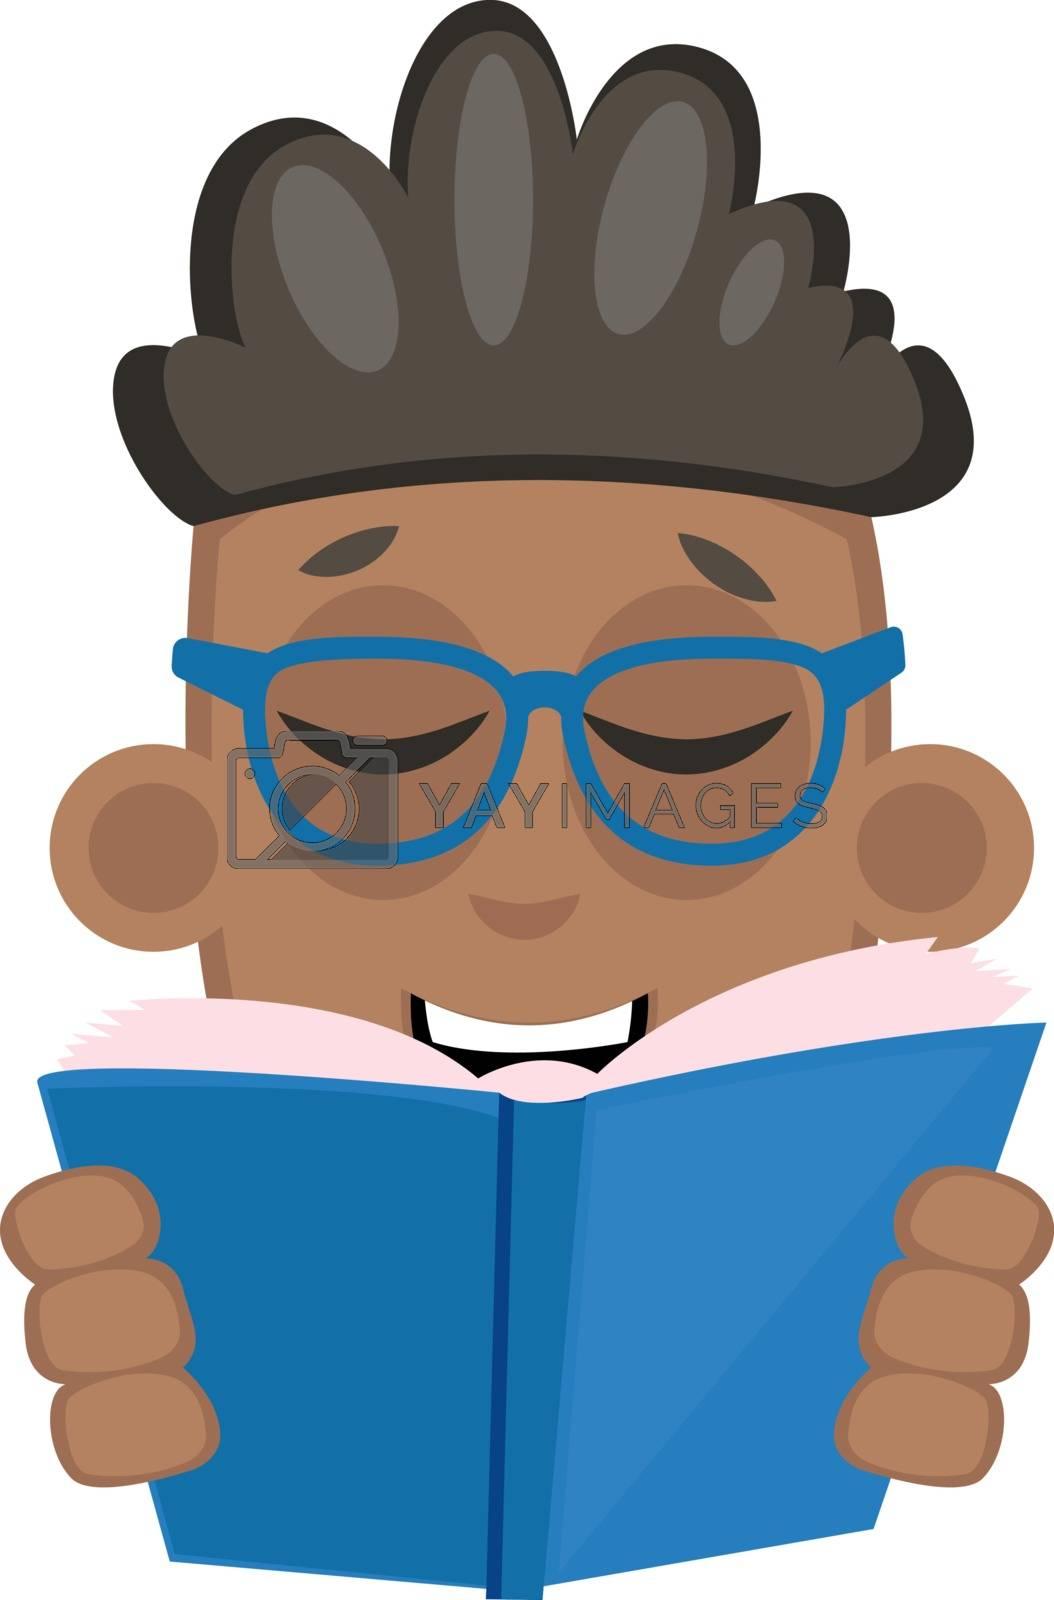 Boy reading book, illustration, vector on white background.